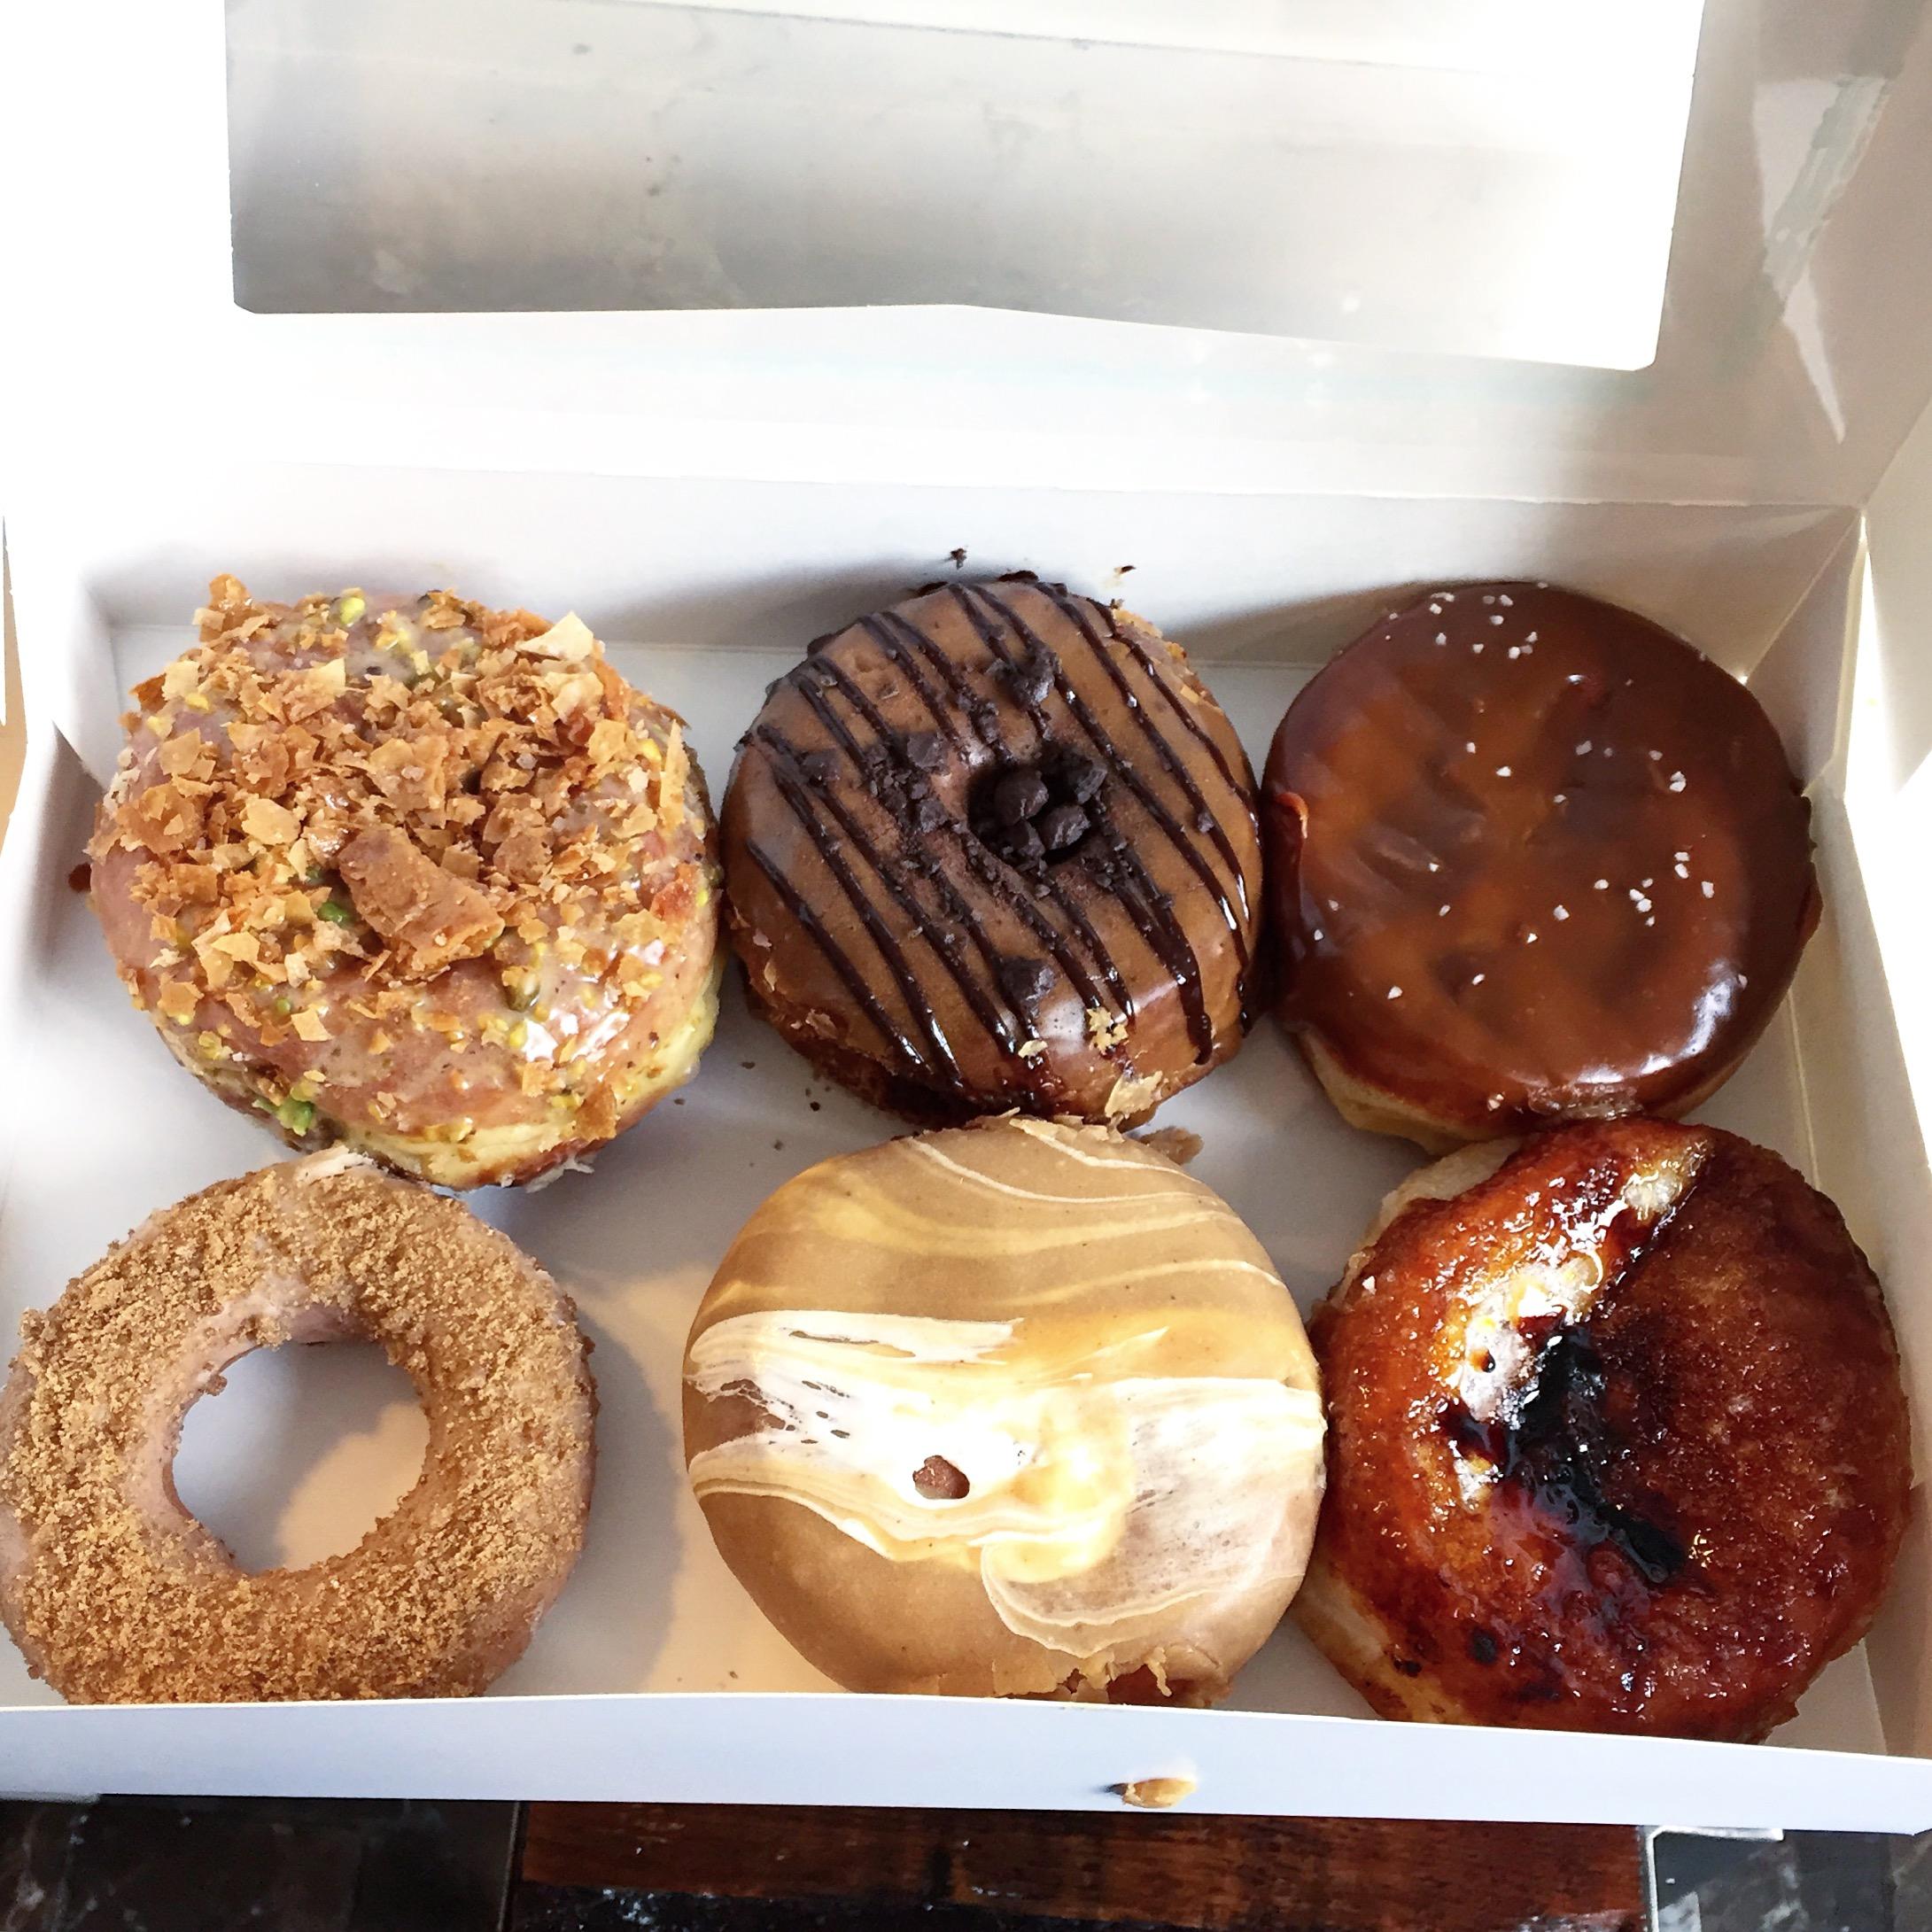 Left to right, top to bottom: Baklava, Dark Chocolate Ganache, Salted Dulce de Leche, Brown Butter, Fluffernutter, Creme Brulee from District Doughnuts